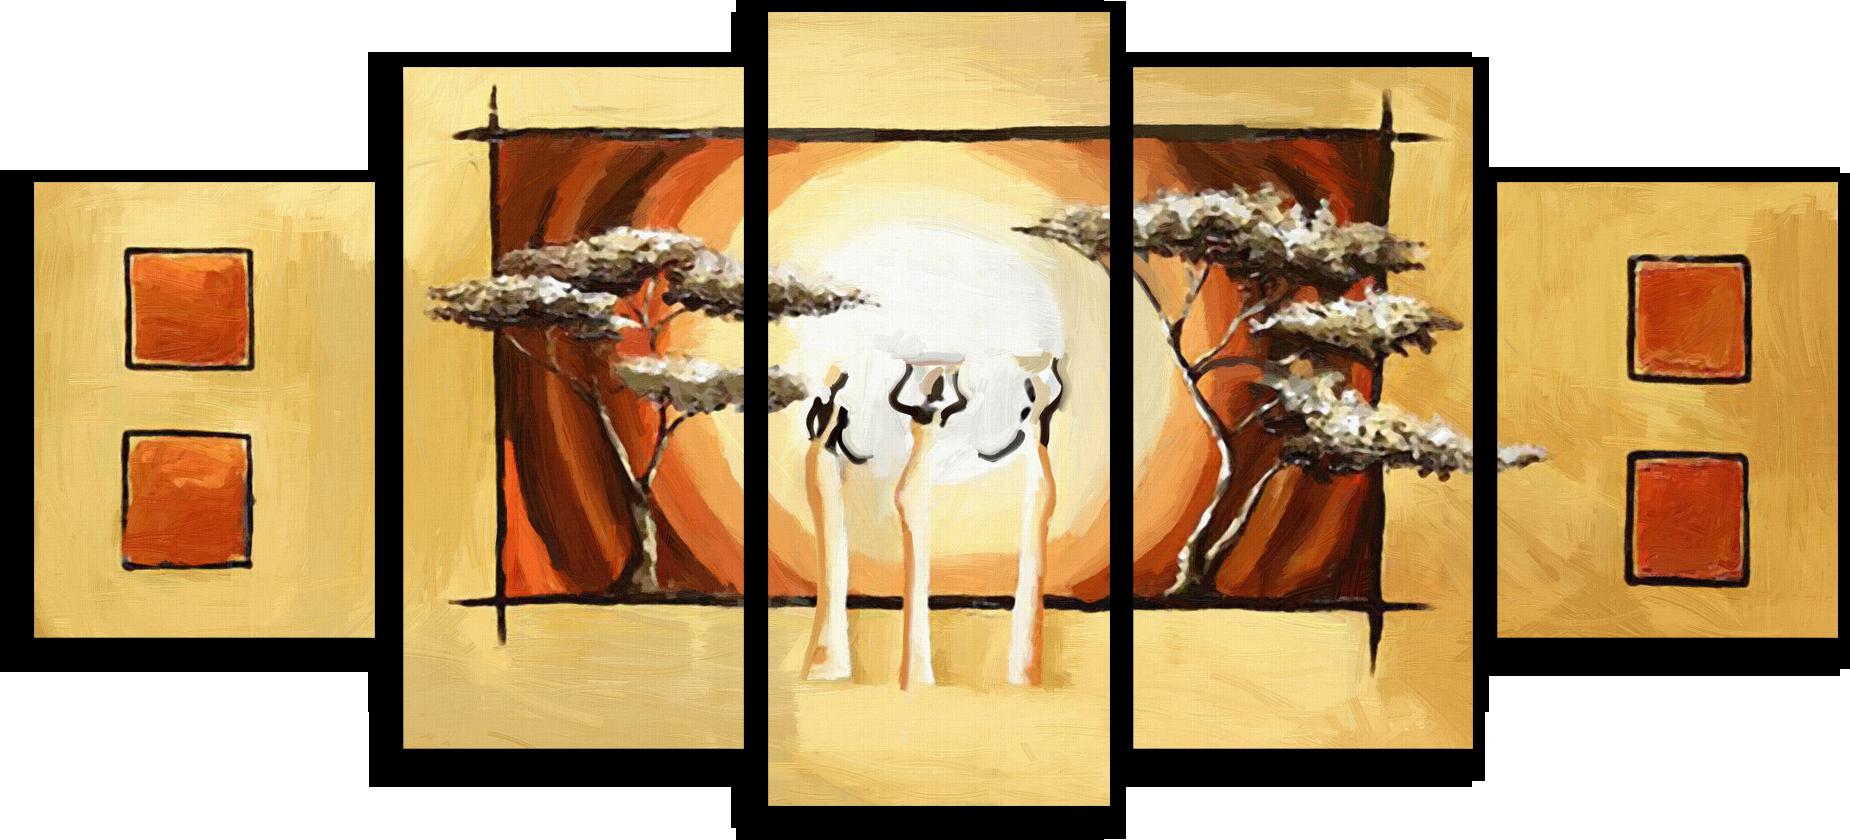 "Абстракция Модульная картина ""Африканская абстракция"" М406.png"